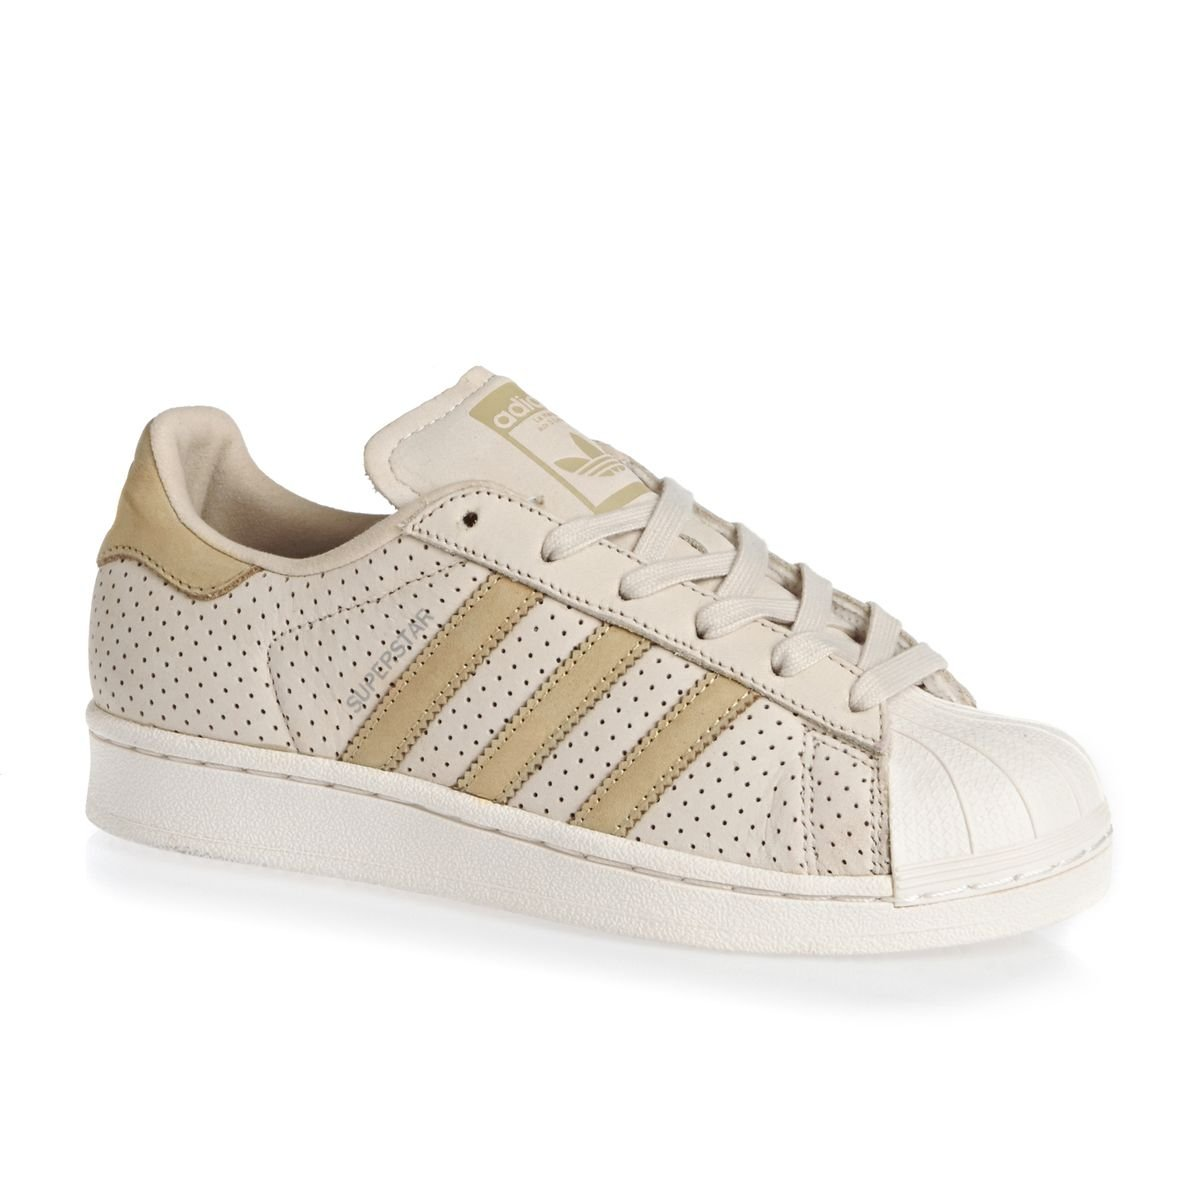 adidas Originals Superstar Fashion J Running Shoe BB2525